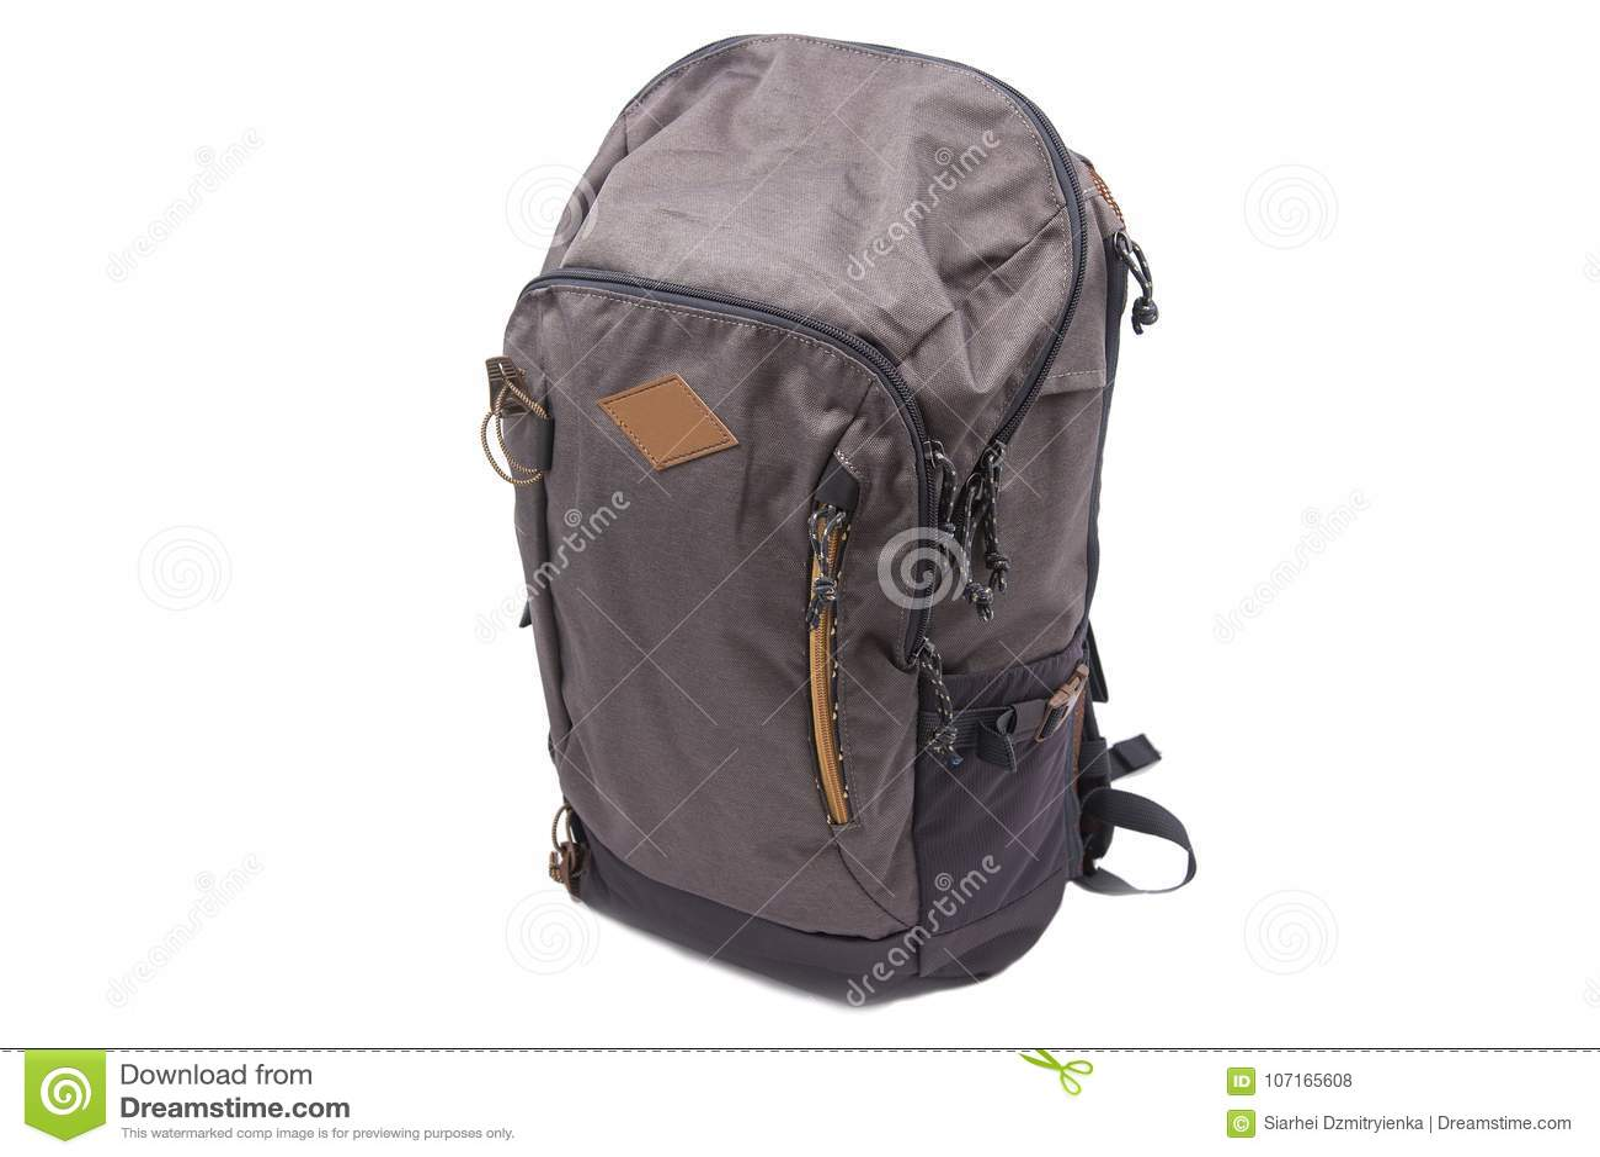 d91f14ac076ea2 Sports backpack for hiking treks isolated on white background. Traveler`s  bag.